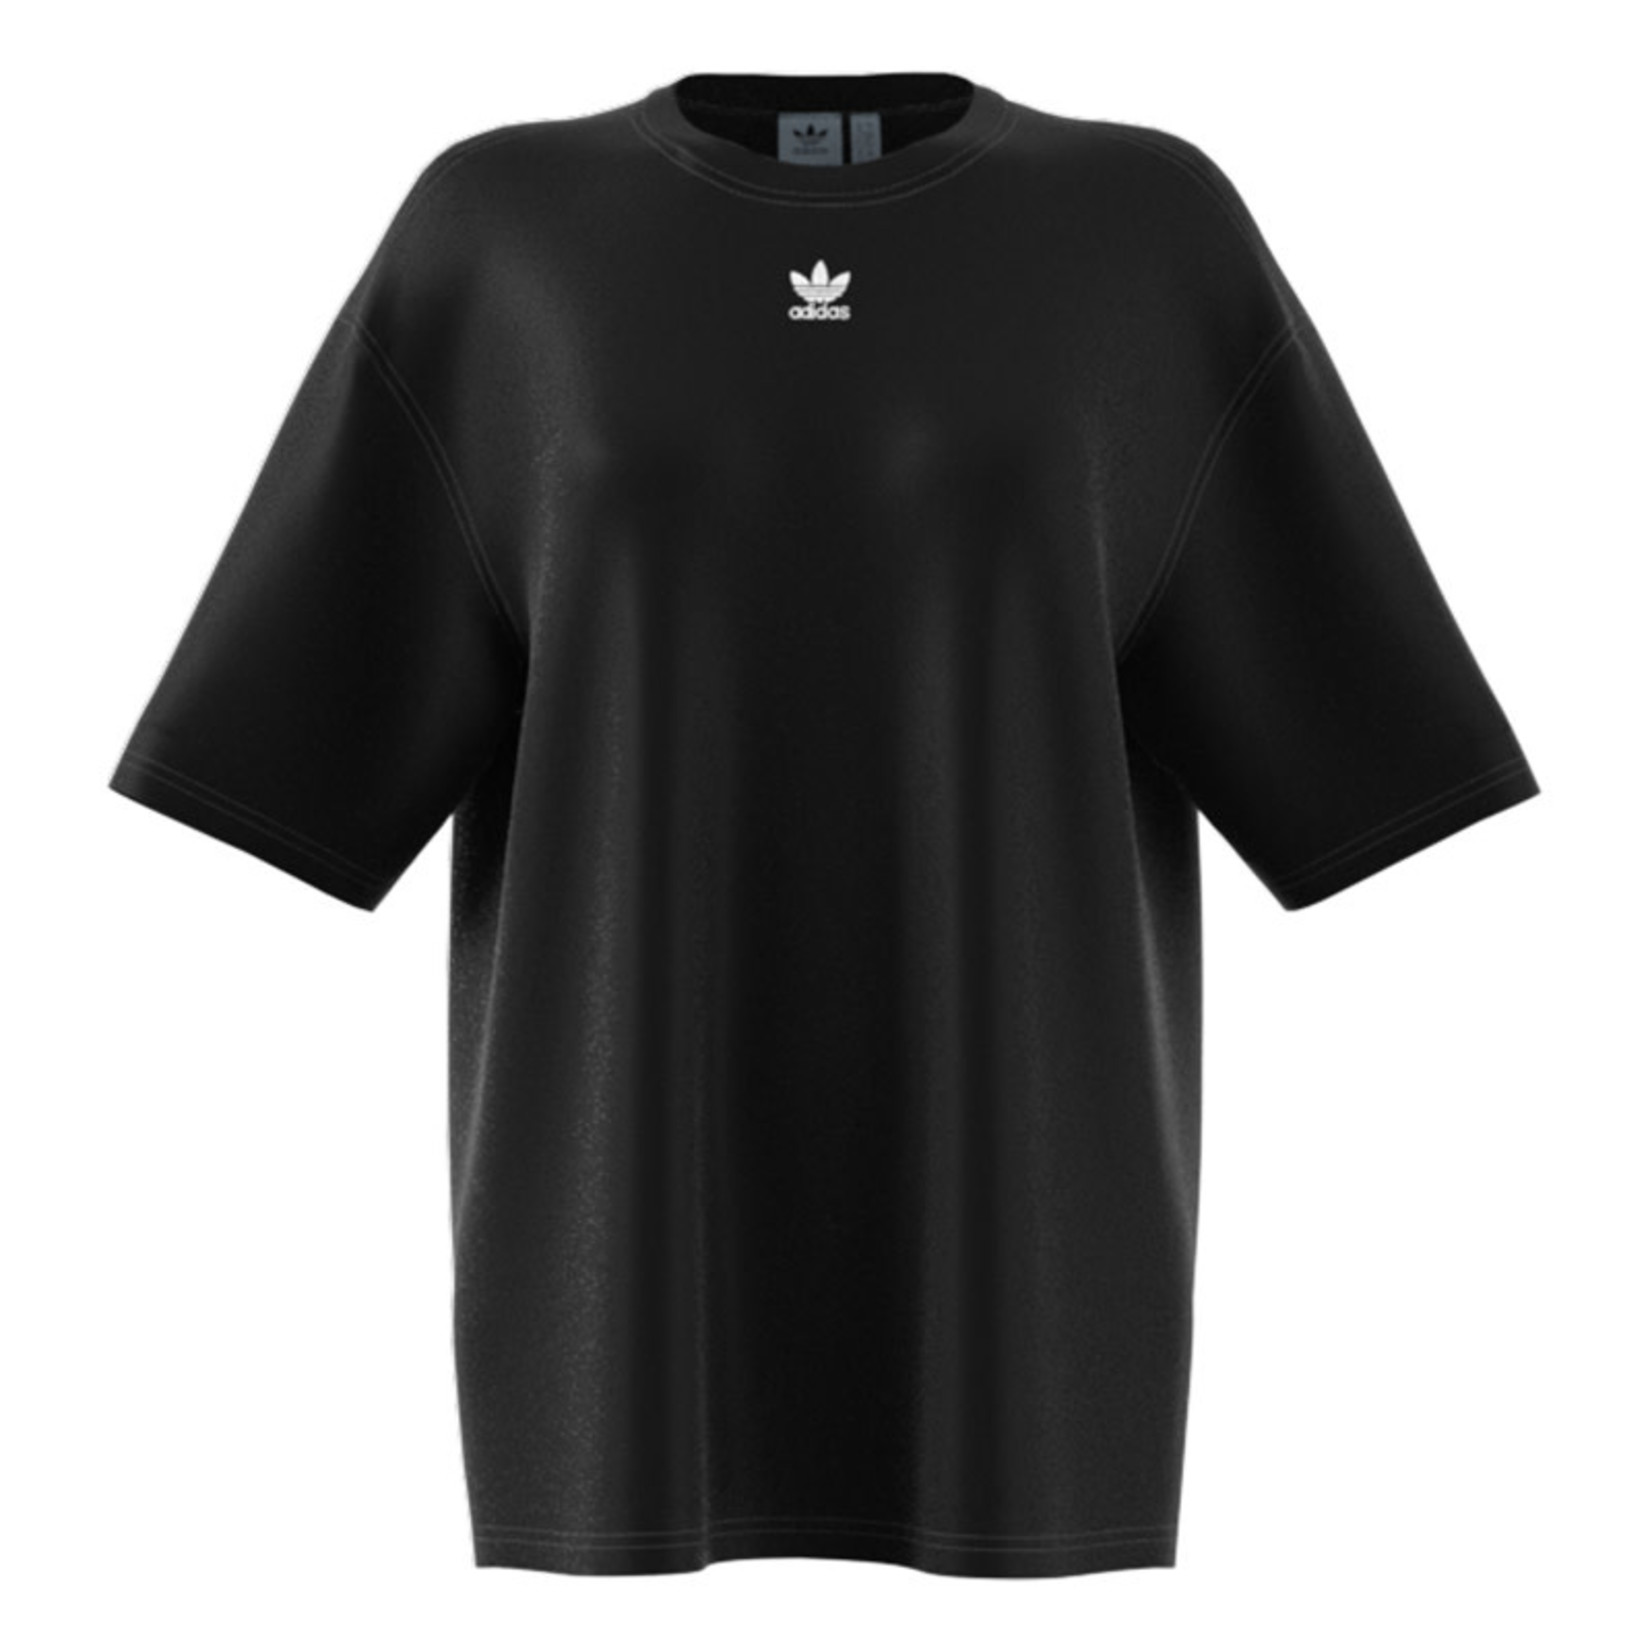 Adidas Adidas : Oversize Boyrfriend T-Shirt